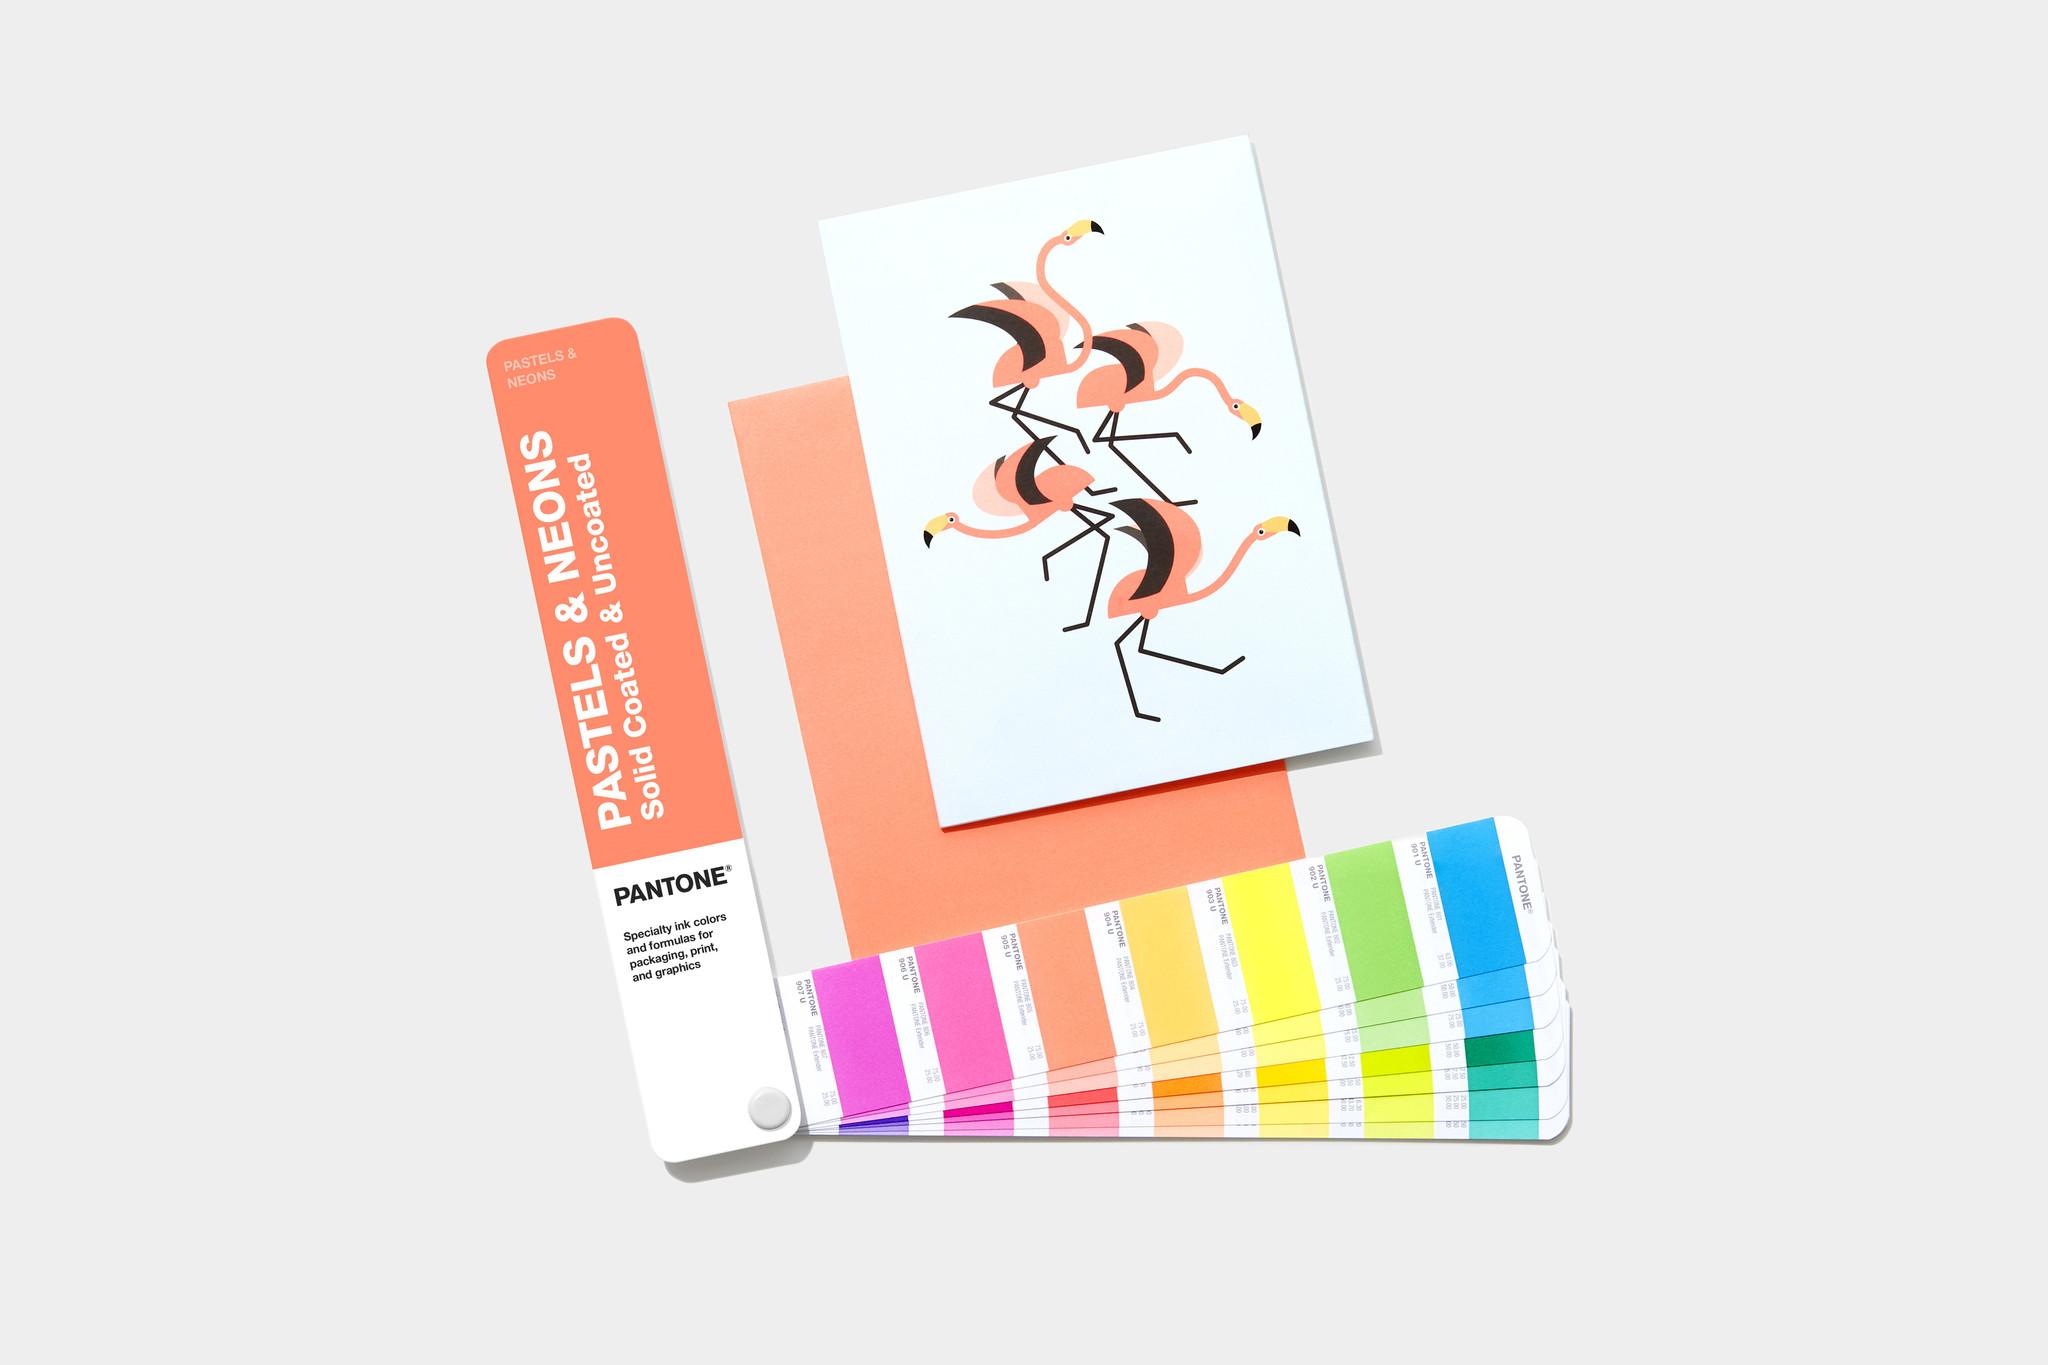 PANTONE PANTONE Pastels & Neons Gids (Coated & Uncoated)